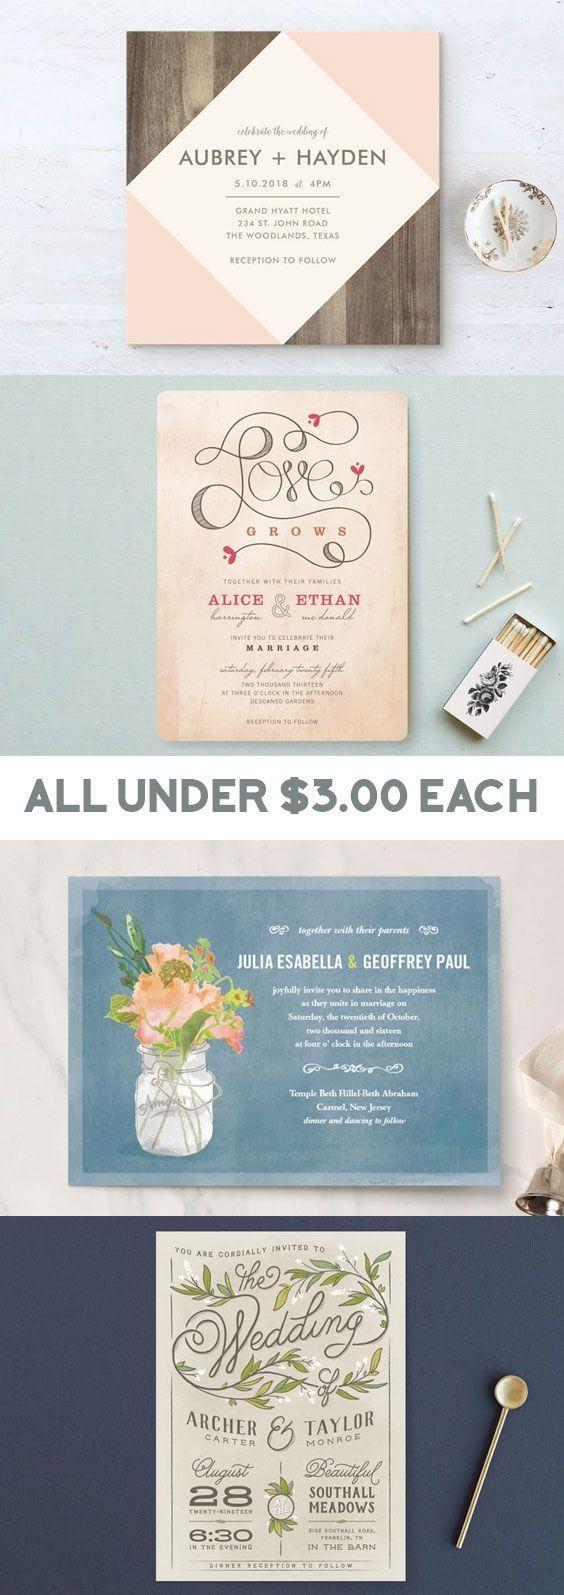 Rustic wedding invitations under $3.00 #barnwedding #invitation ...